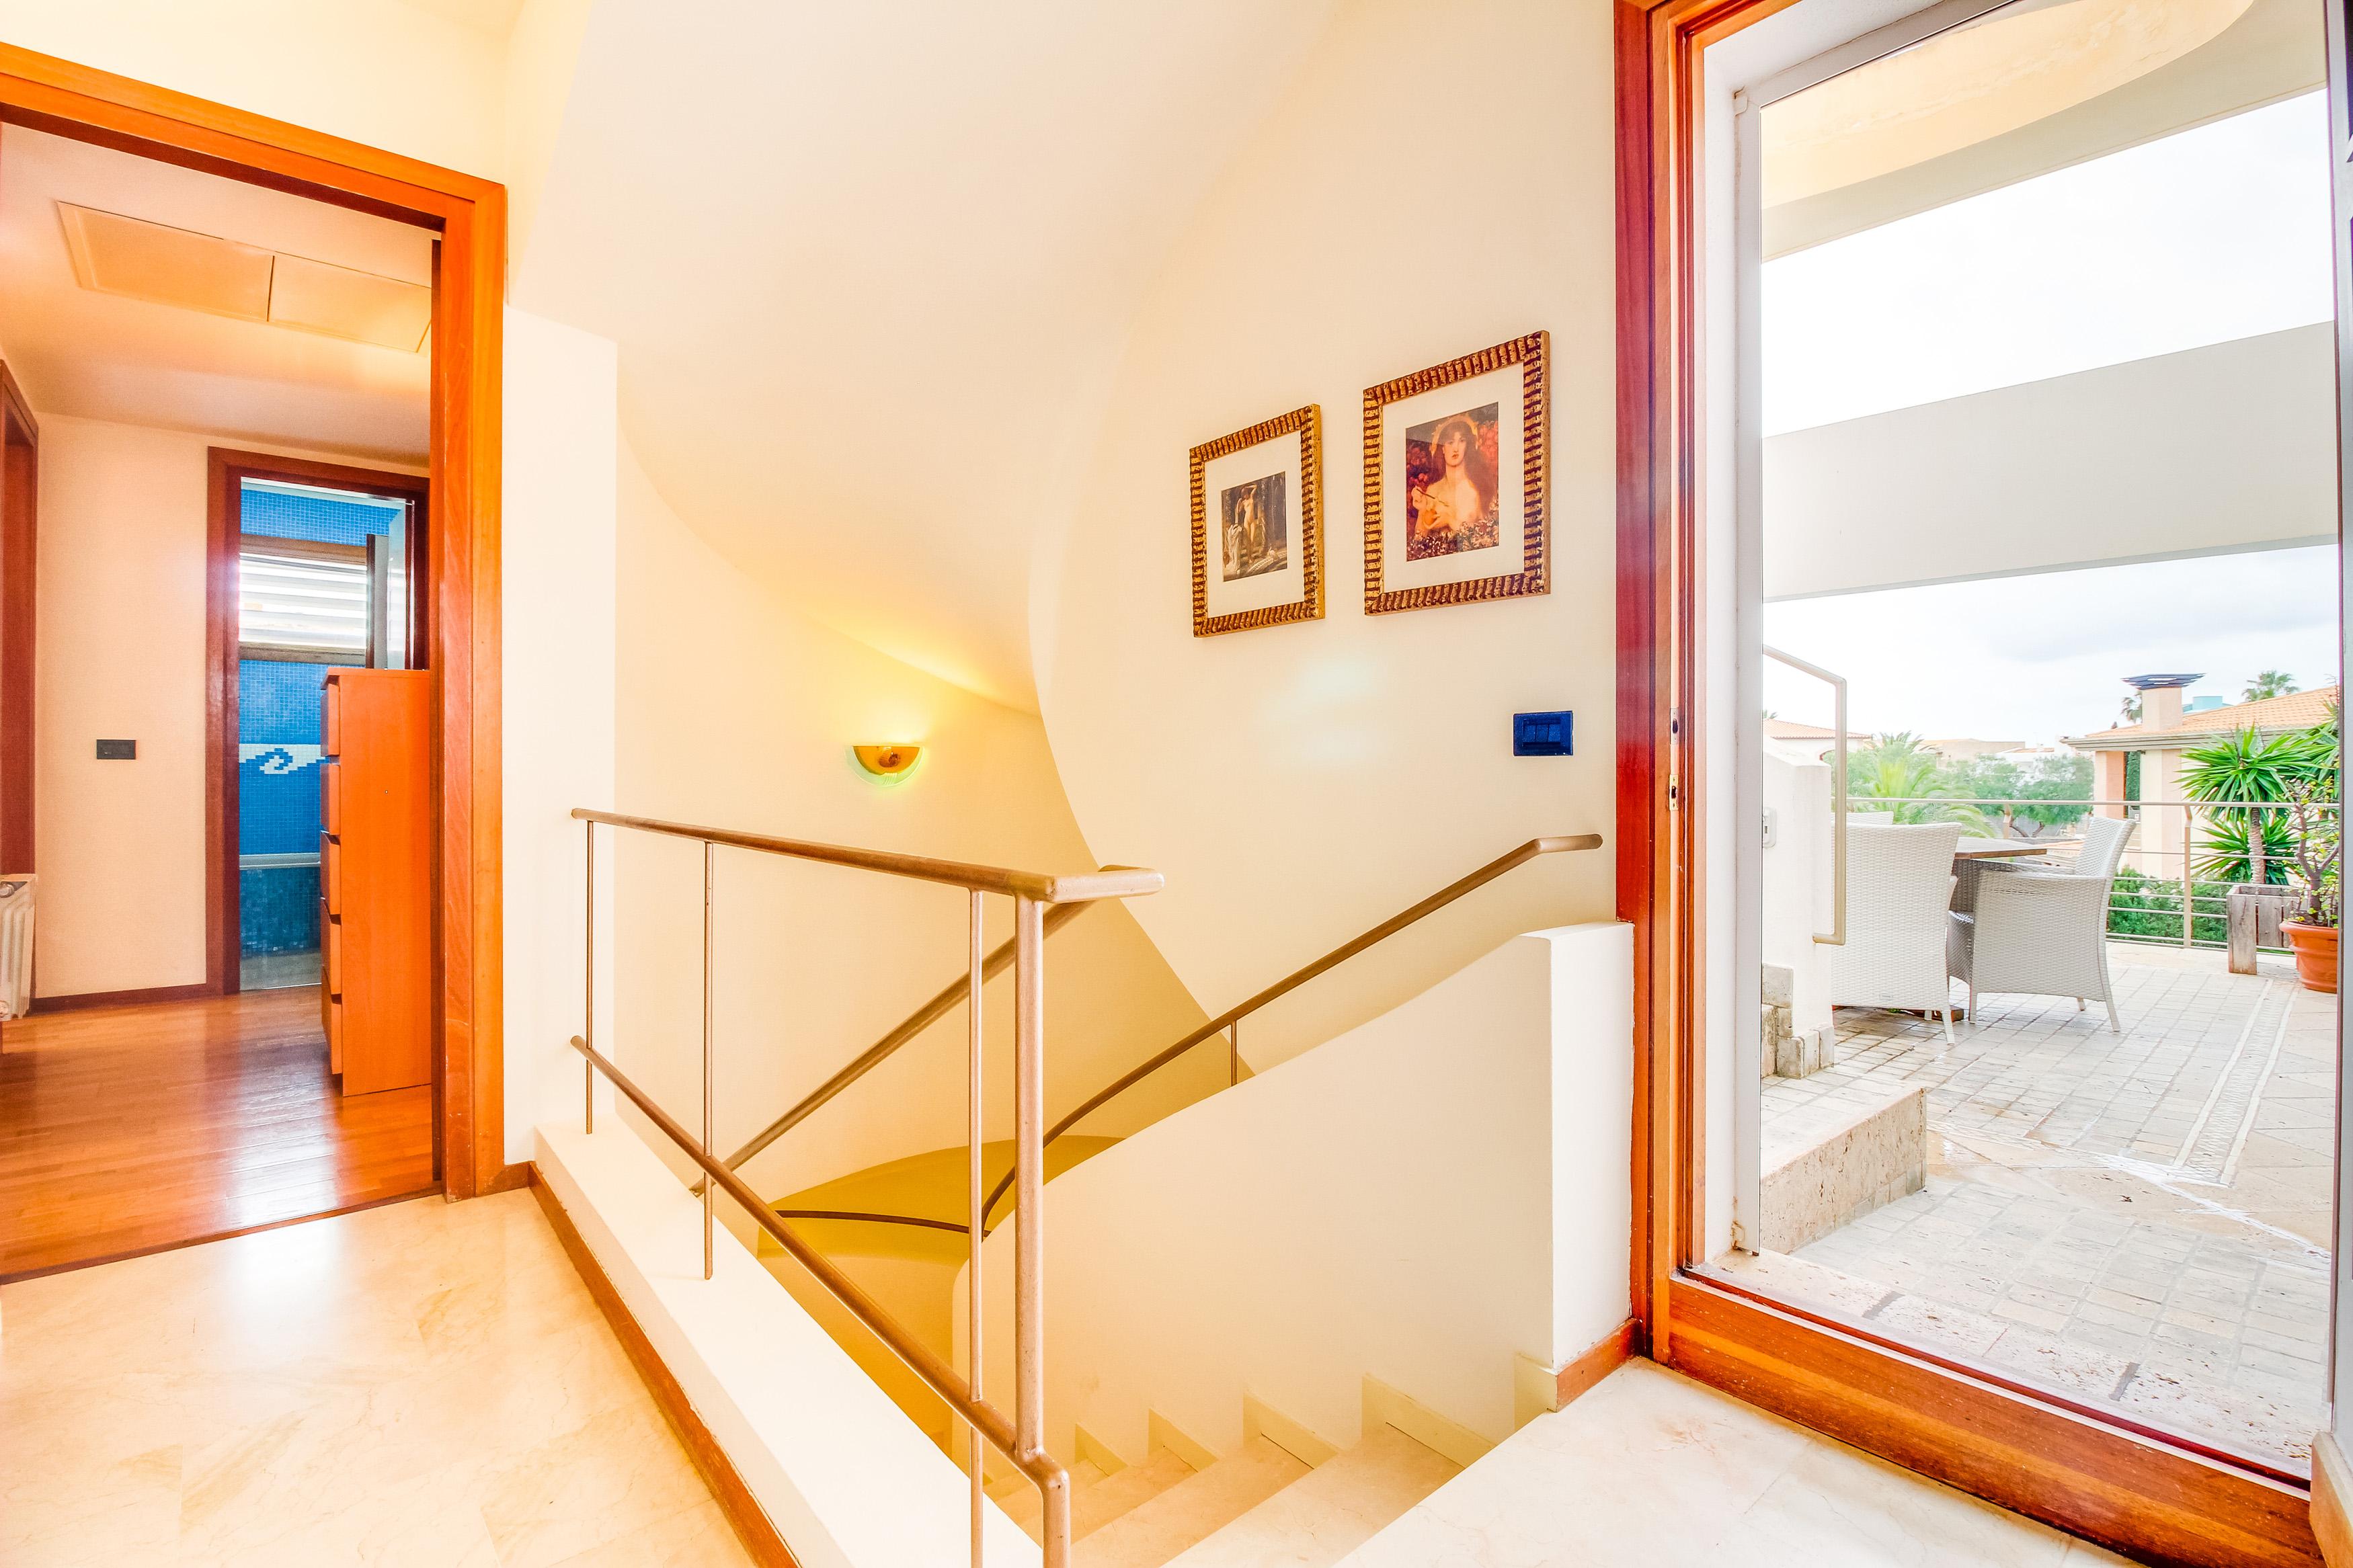 Apartment Villa Cala Blava photo 20399455